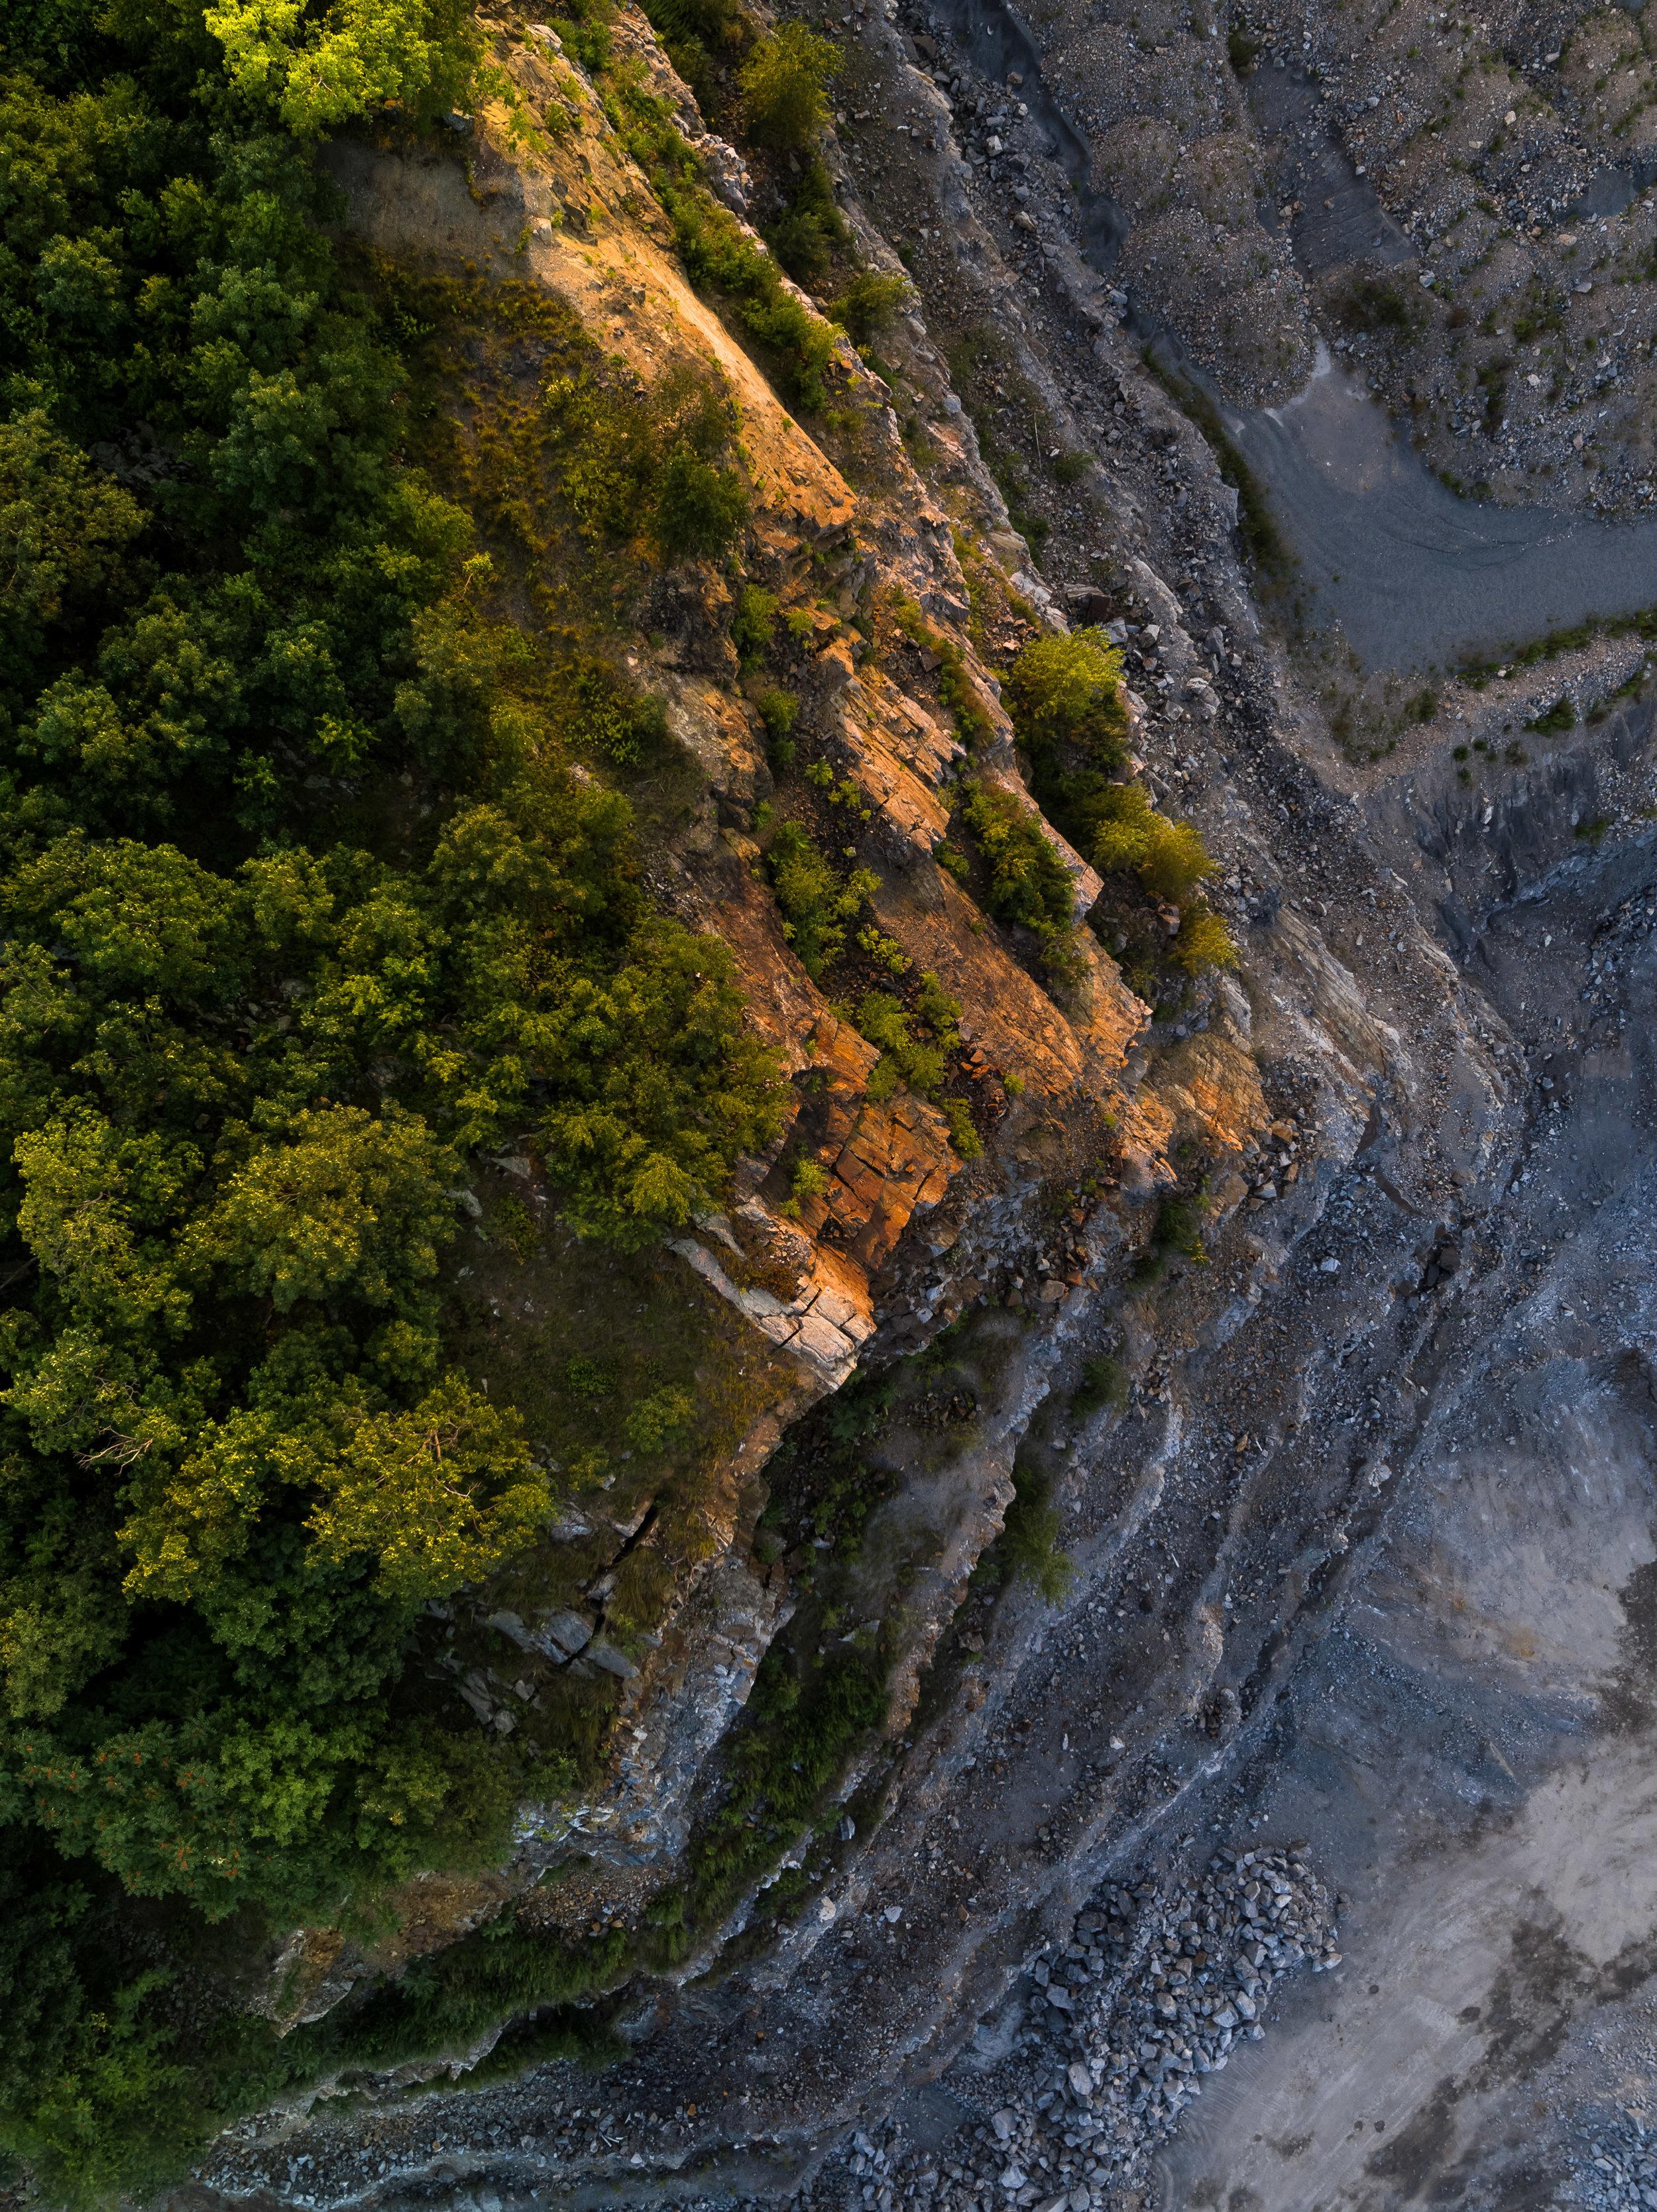 quarrytest_typoland_aerial-4.jpg